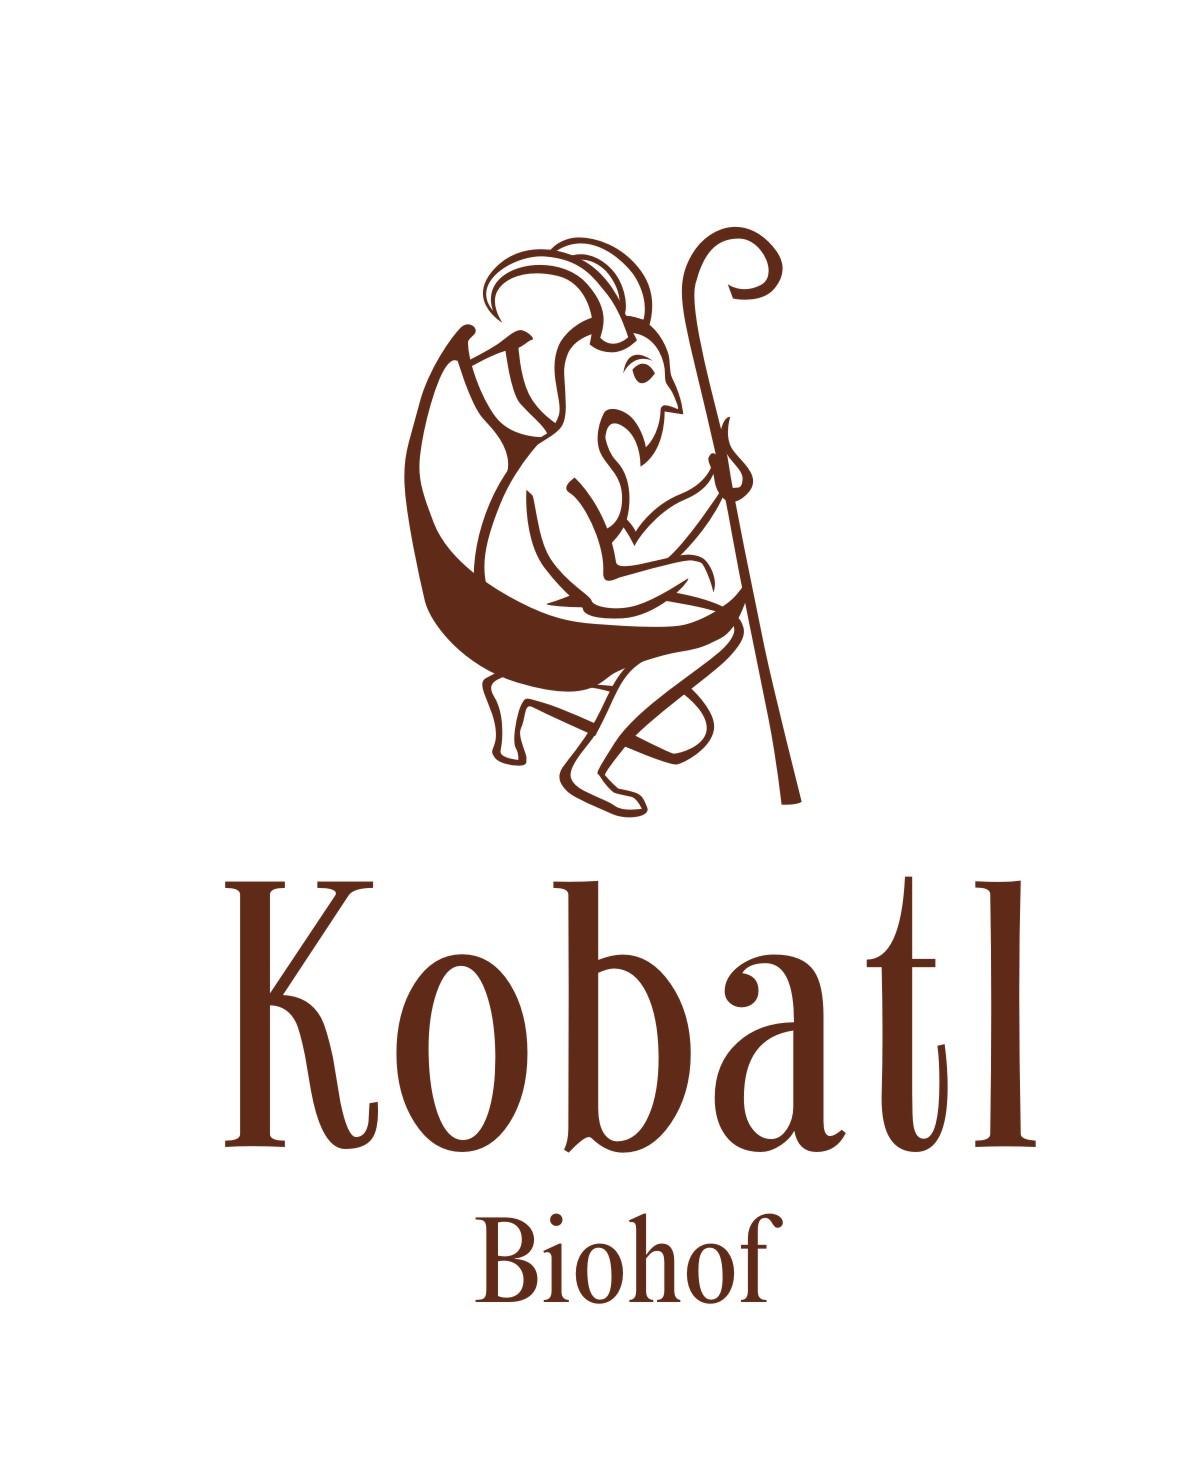 Kobatl_Biohof_Marke_ok